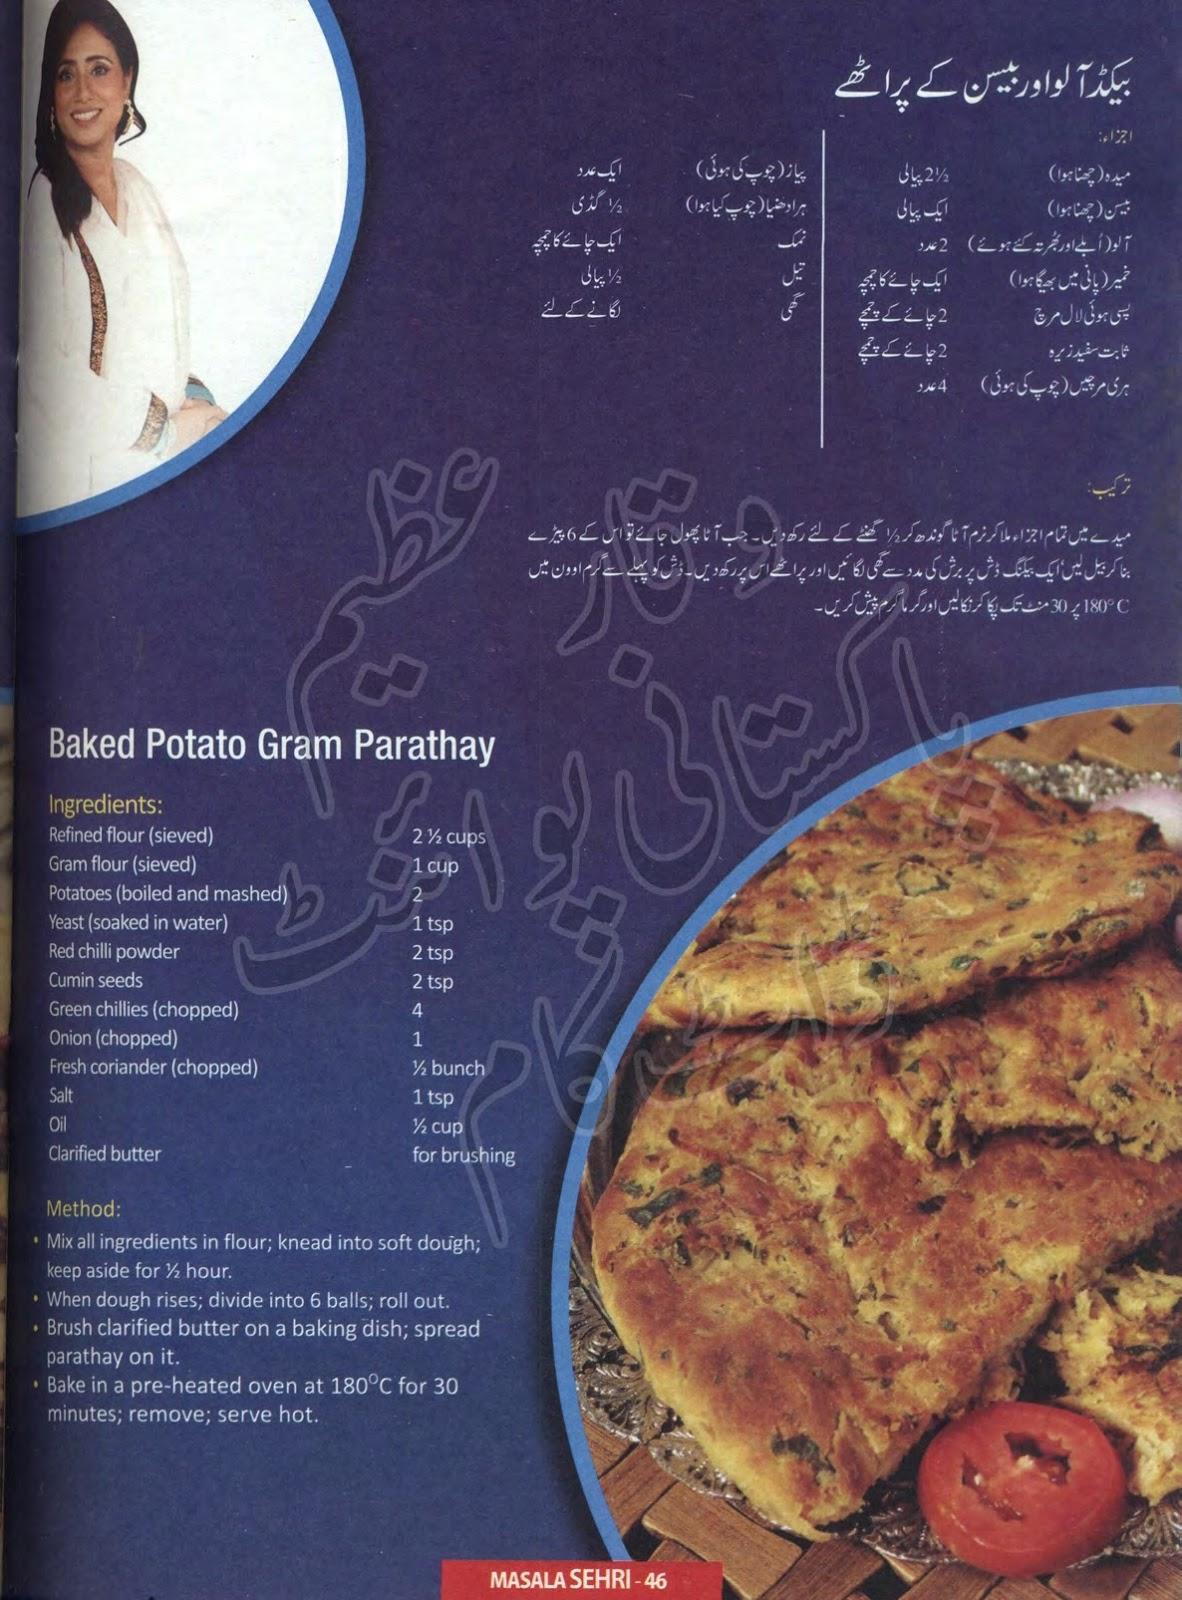 Masala food magazine 2013 recipes book urdu books and islamic free urdu books forumfinder Images